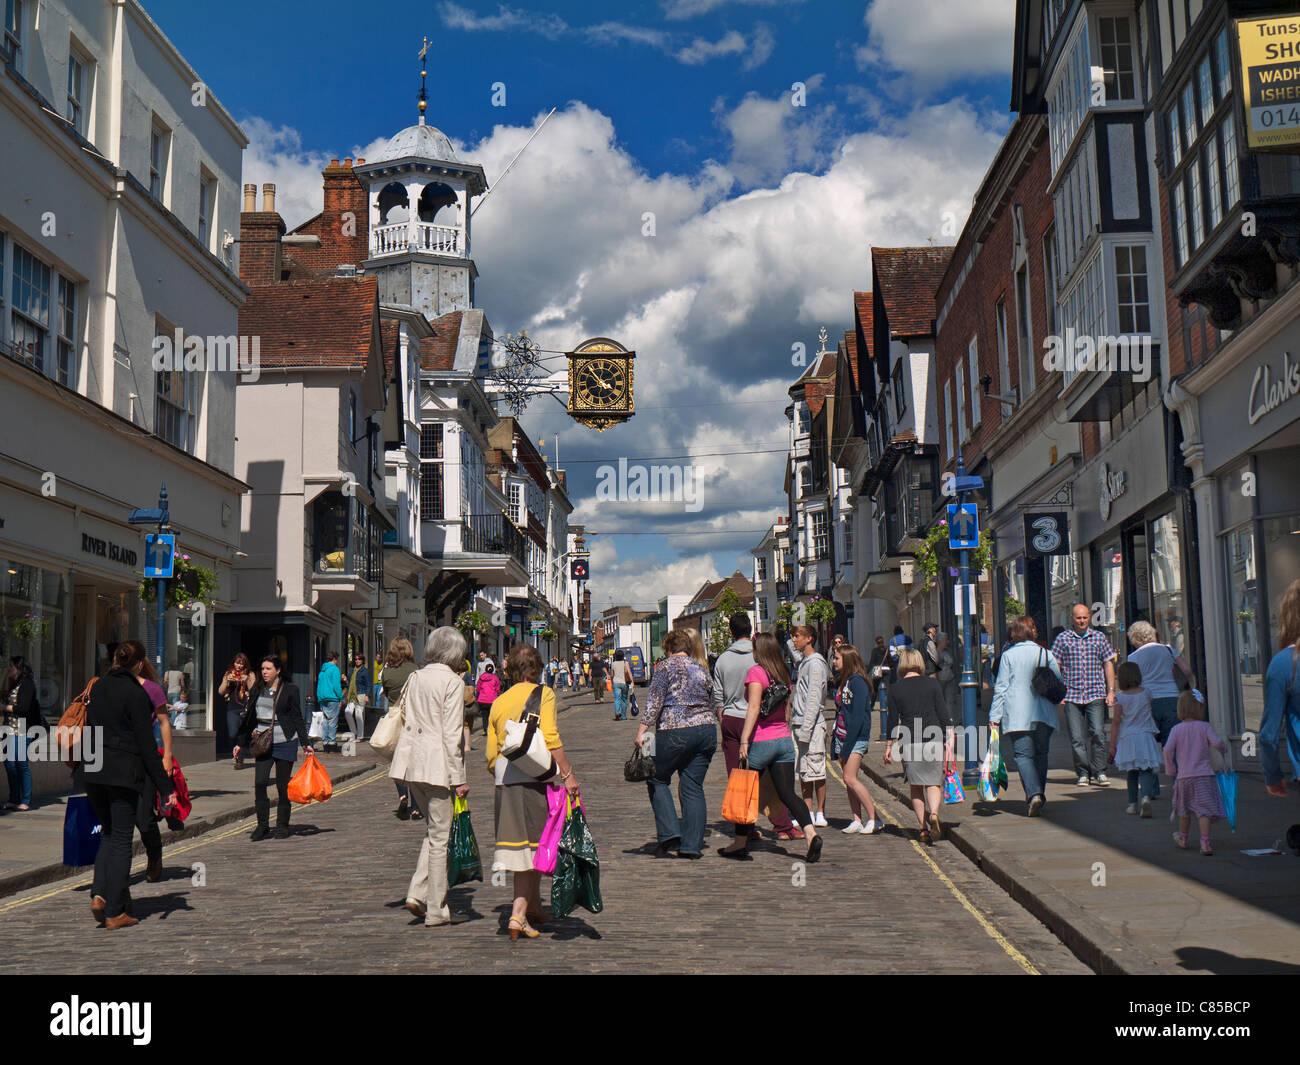 Shoppers in Guildford historic cobbled High Street enjoying spring sunshine Guildford Surrey UK - Stock Image